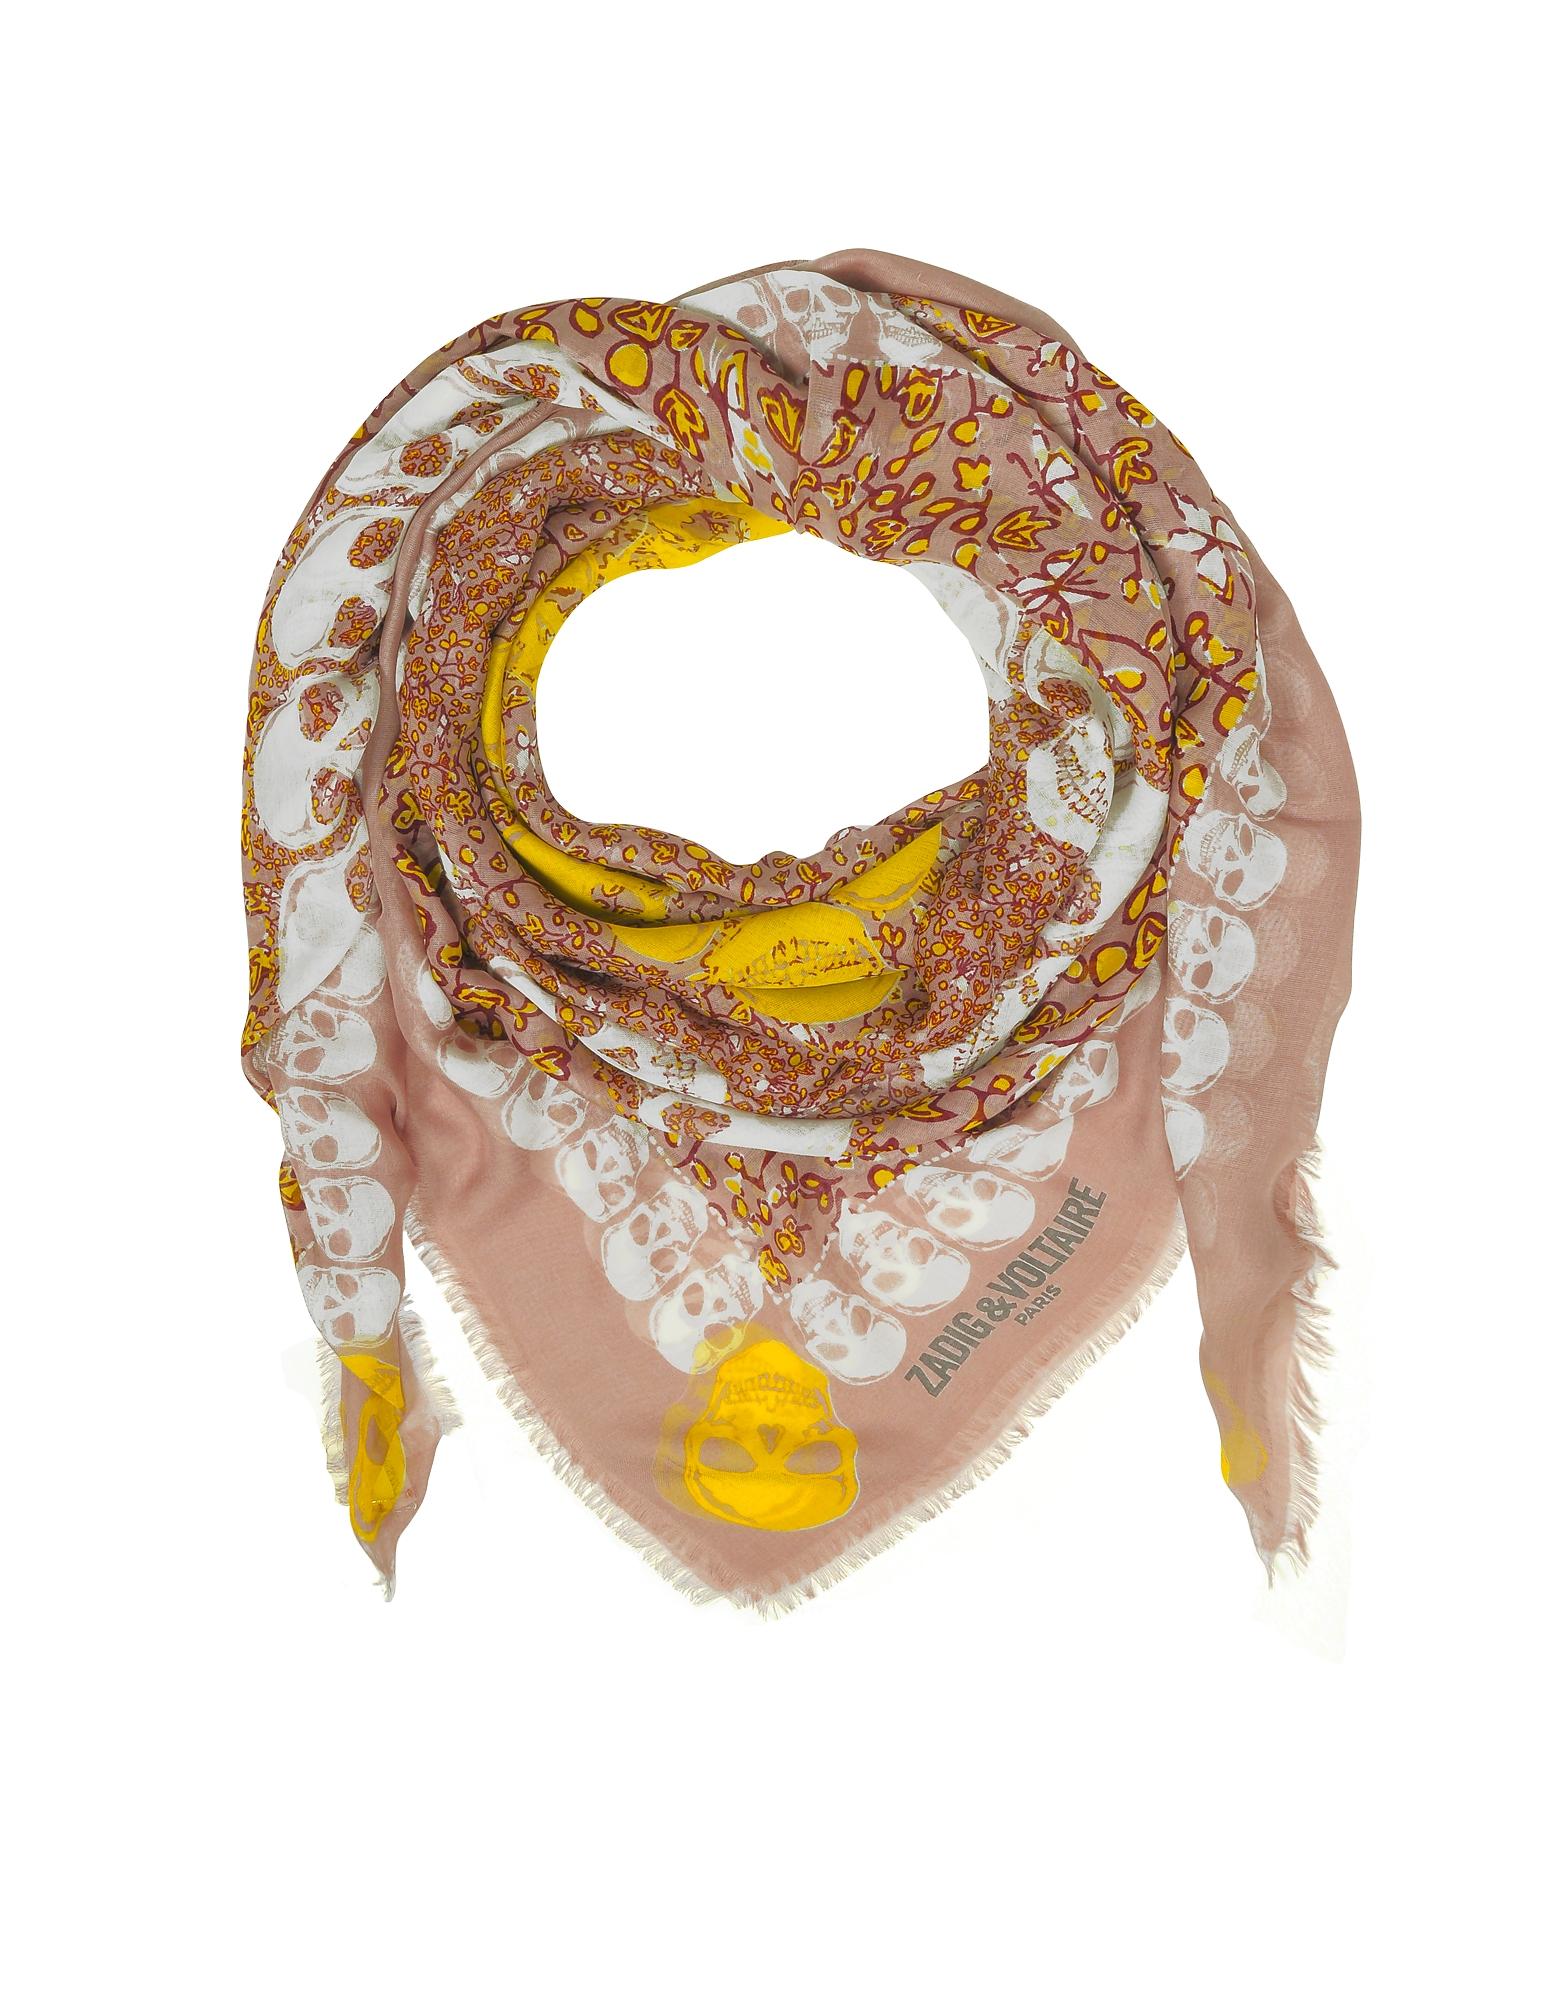 Image of Zadig & Voltaire Designer Scarves, Modal Printed Kerry Garden Wrap